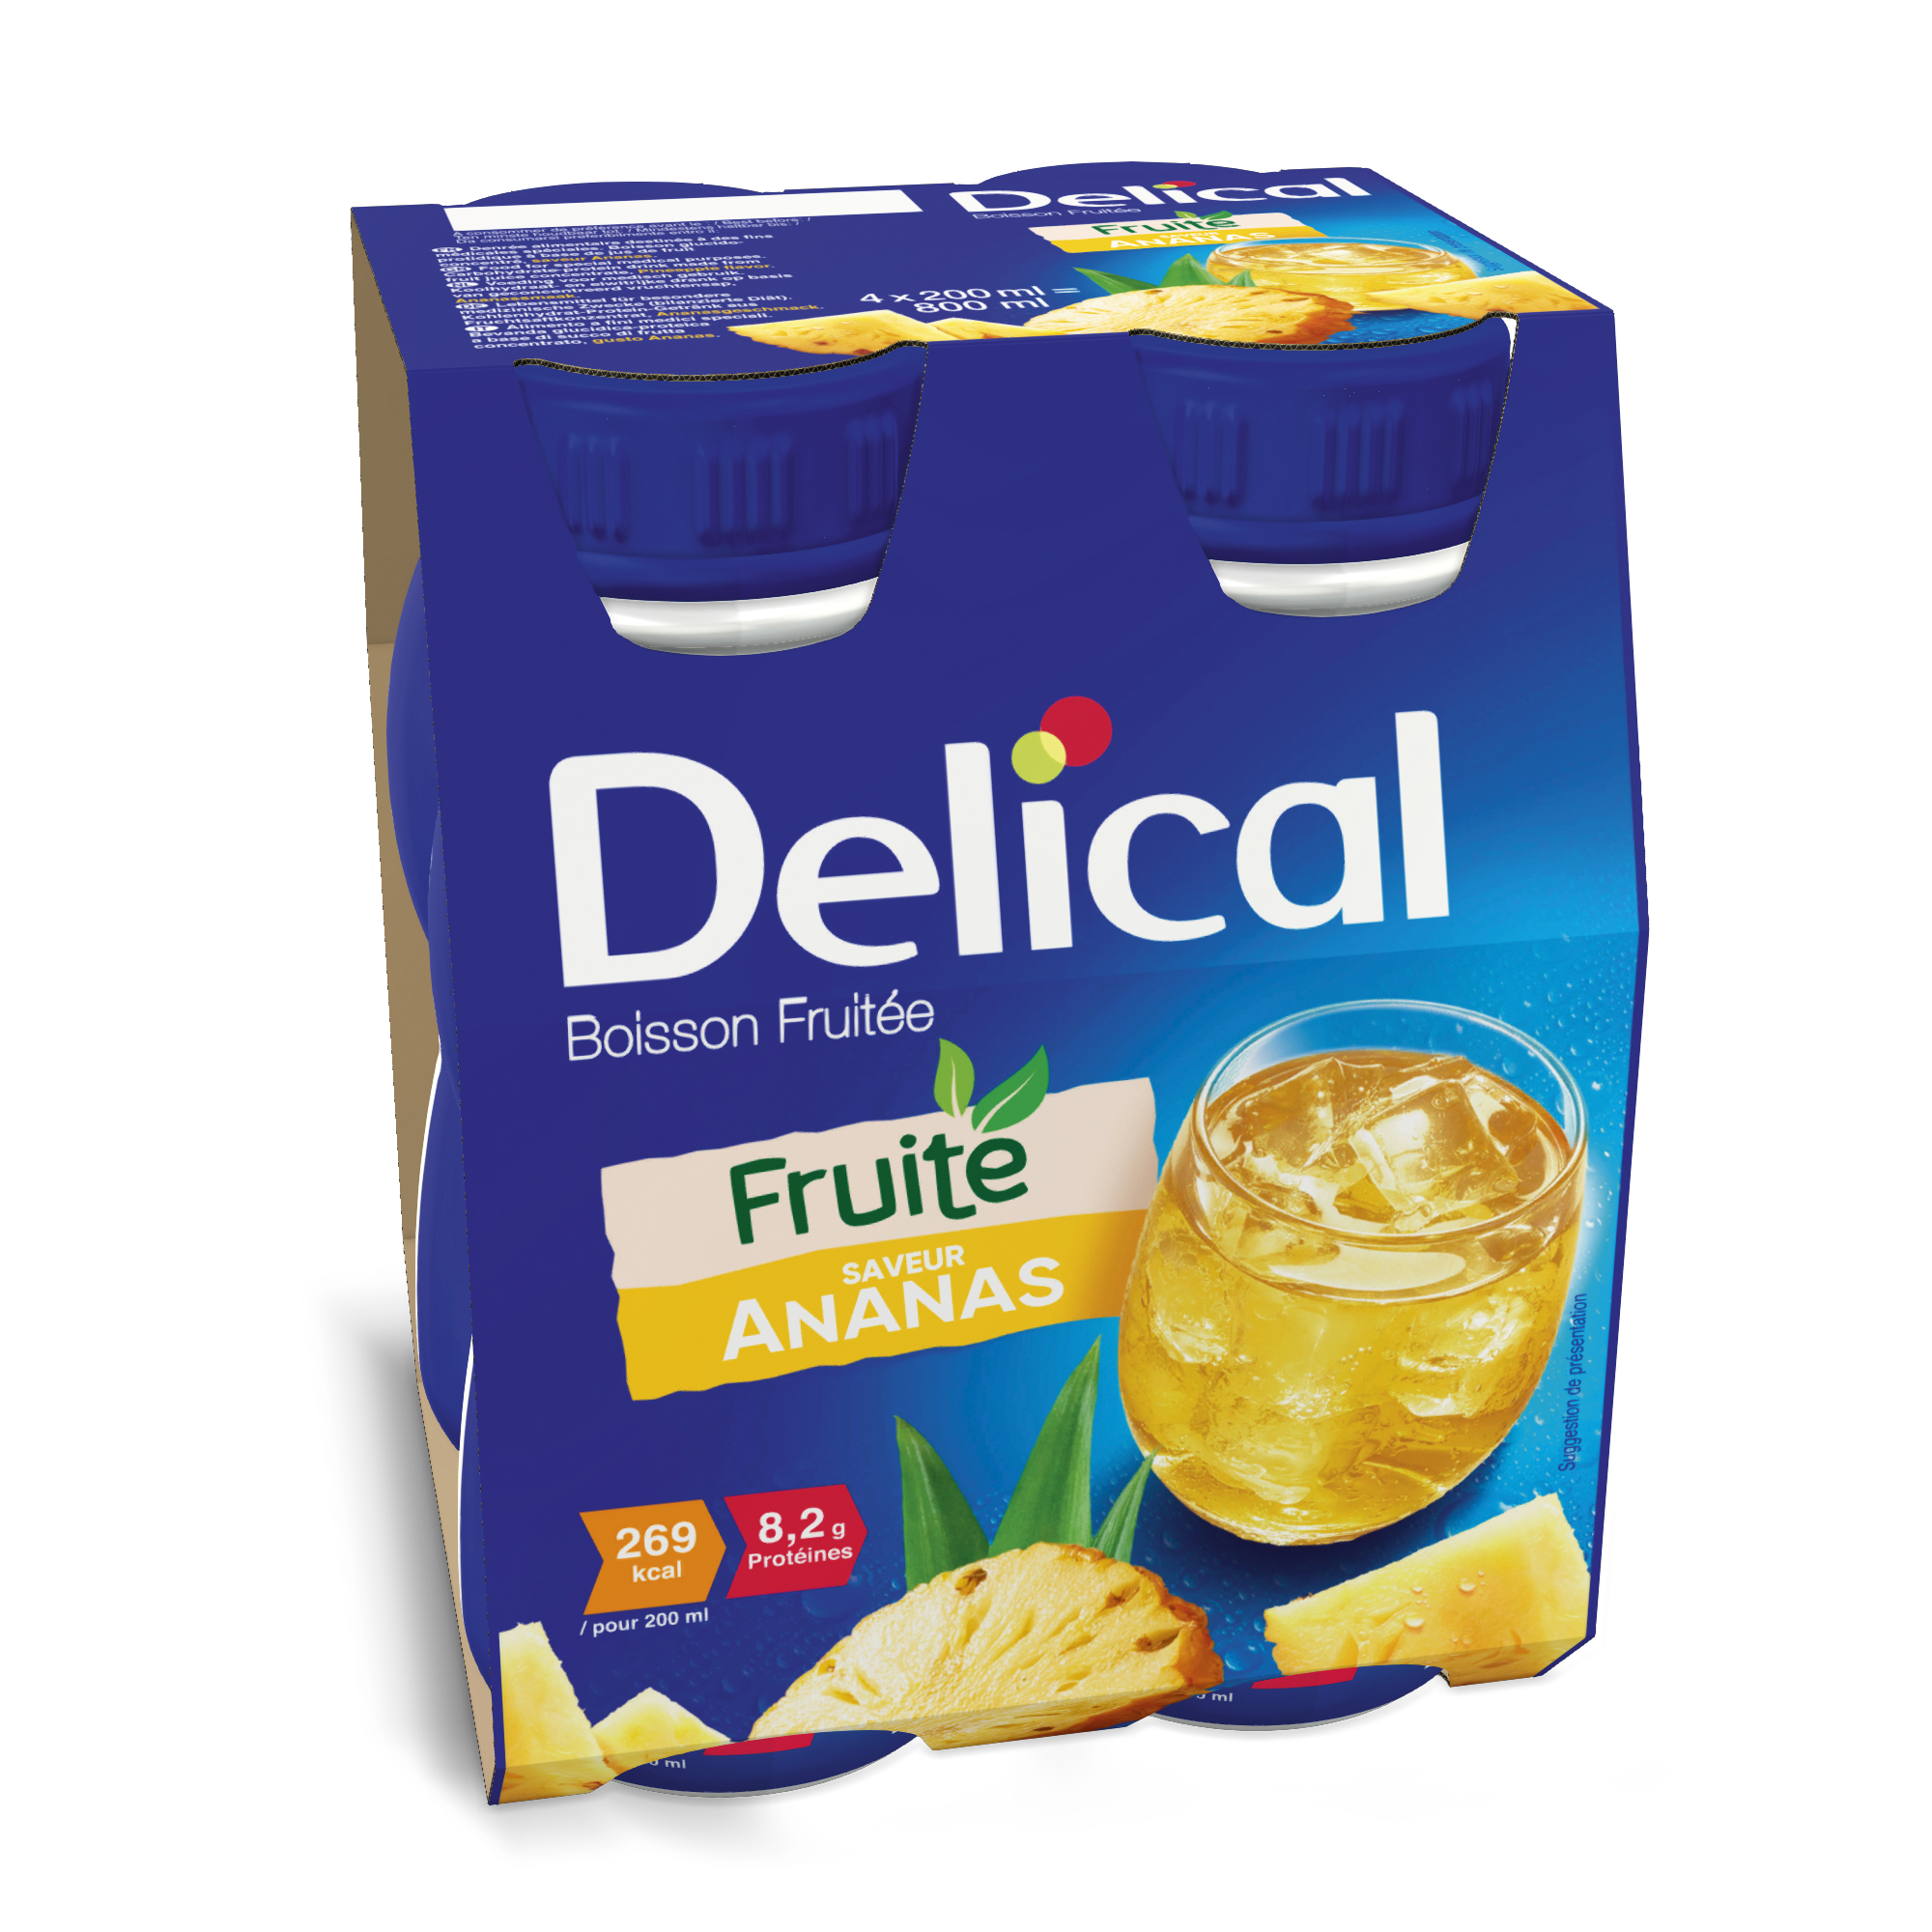 Delical Boisson Fruitee Ananas